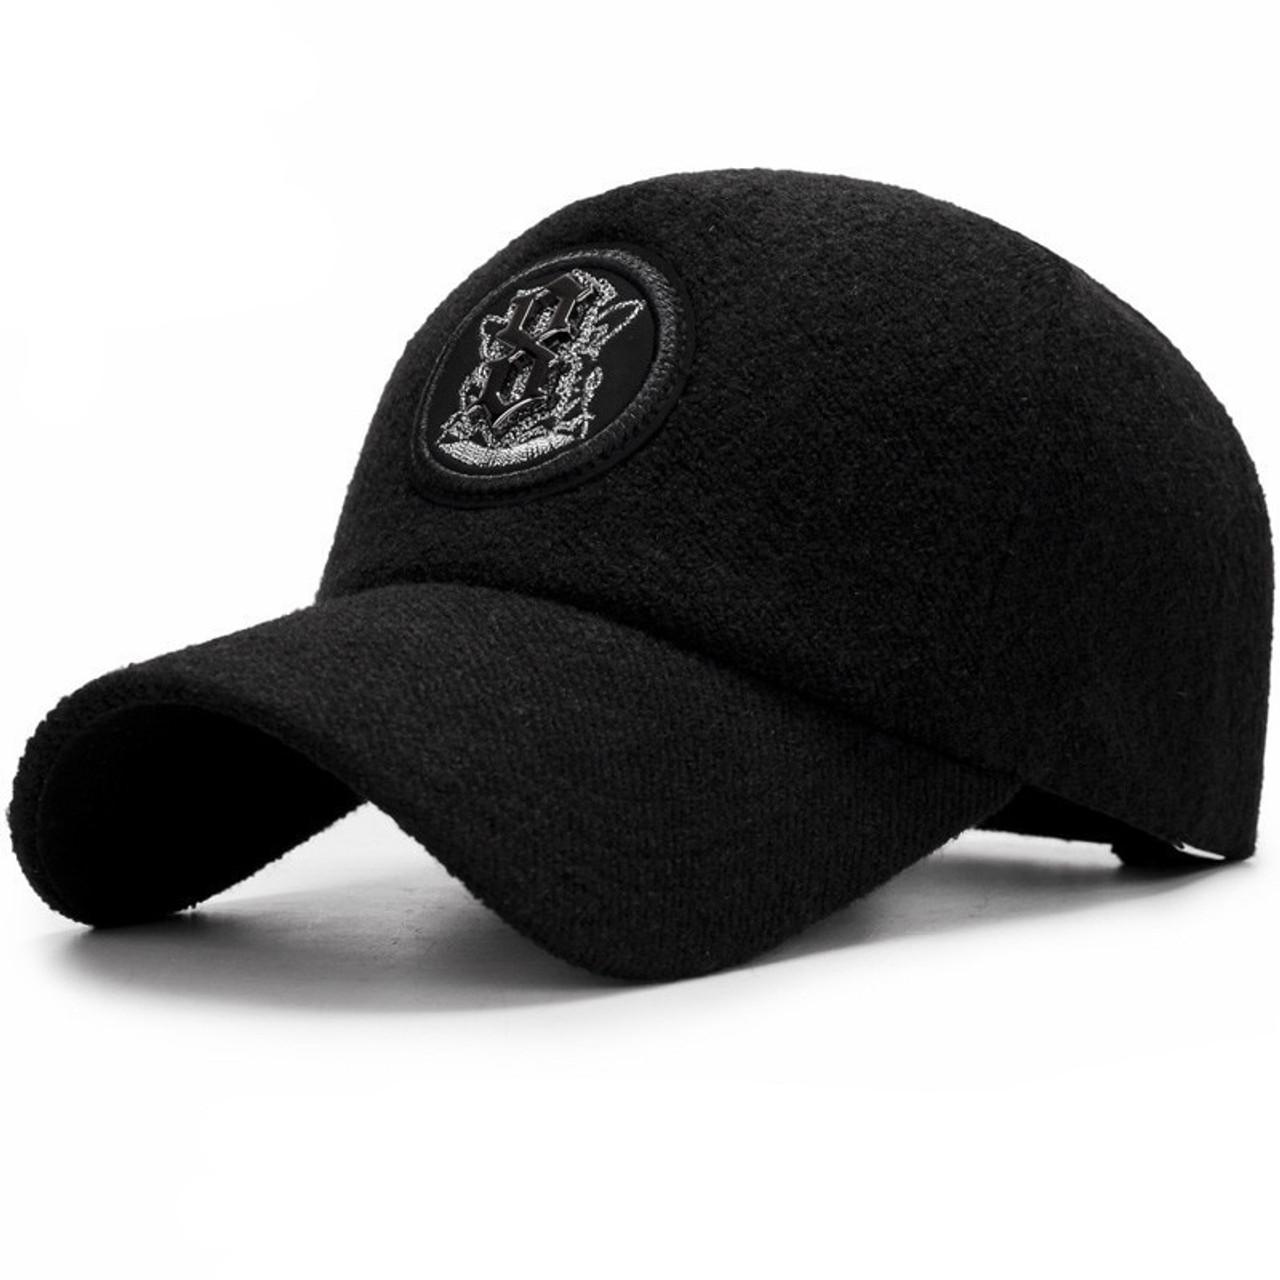 6a87ba9c341bf ... Baseball Cap Mens Hat Spring Chance The Rapper Hats Custom Snapback  Cowboy Man Black Luxury Brand ...